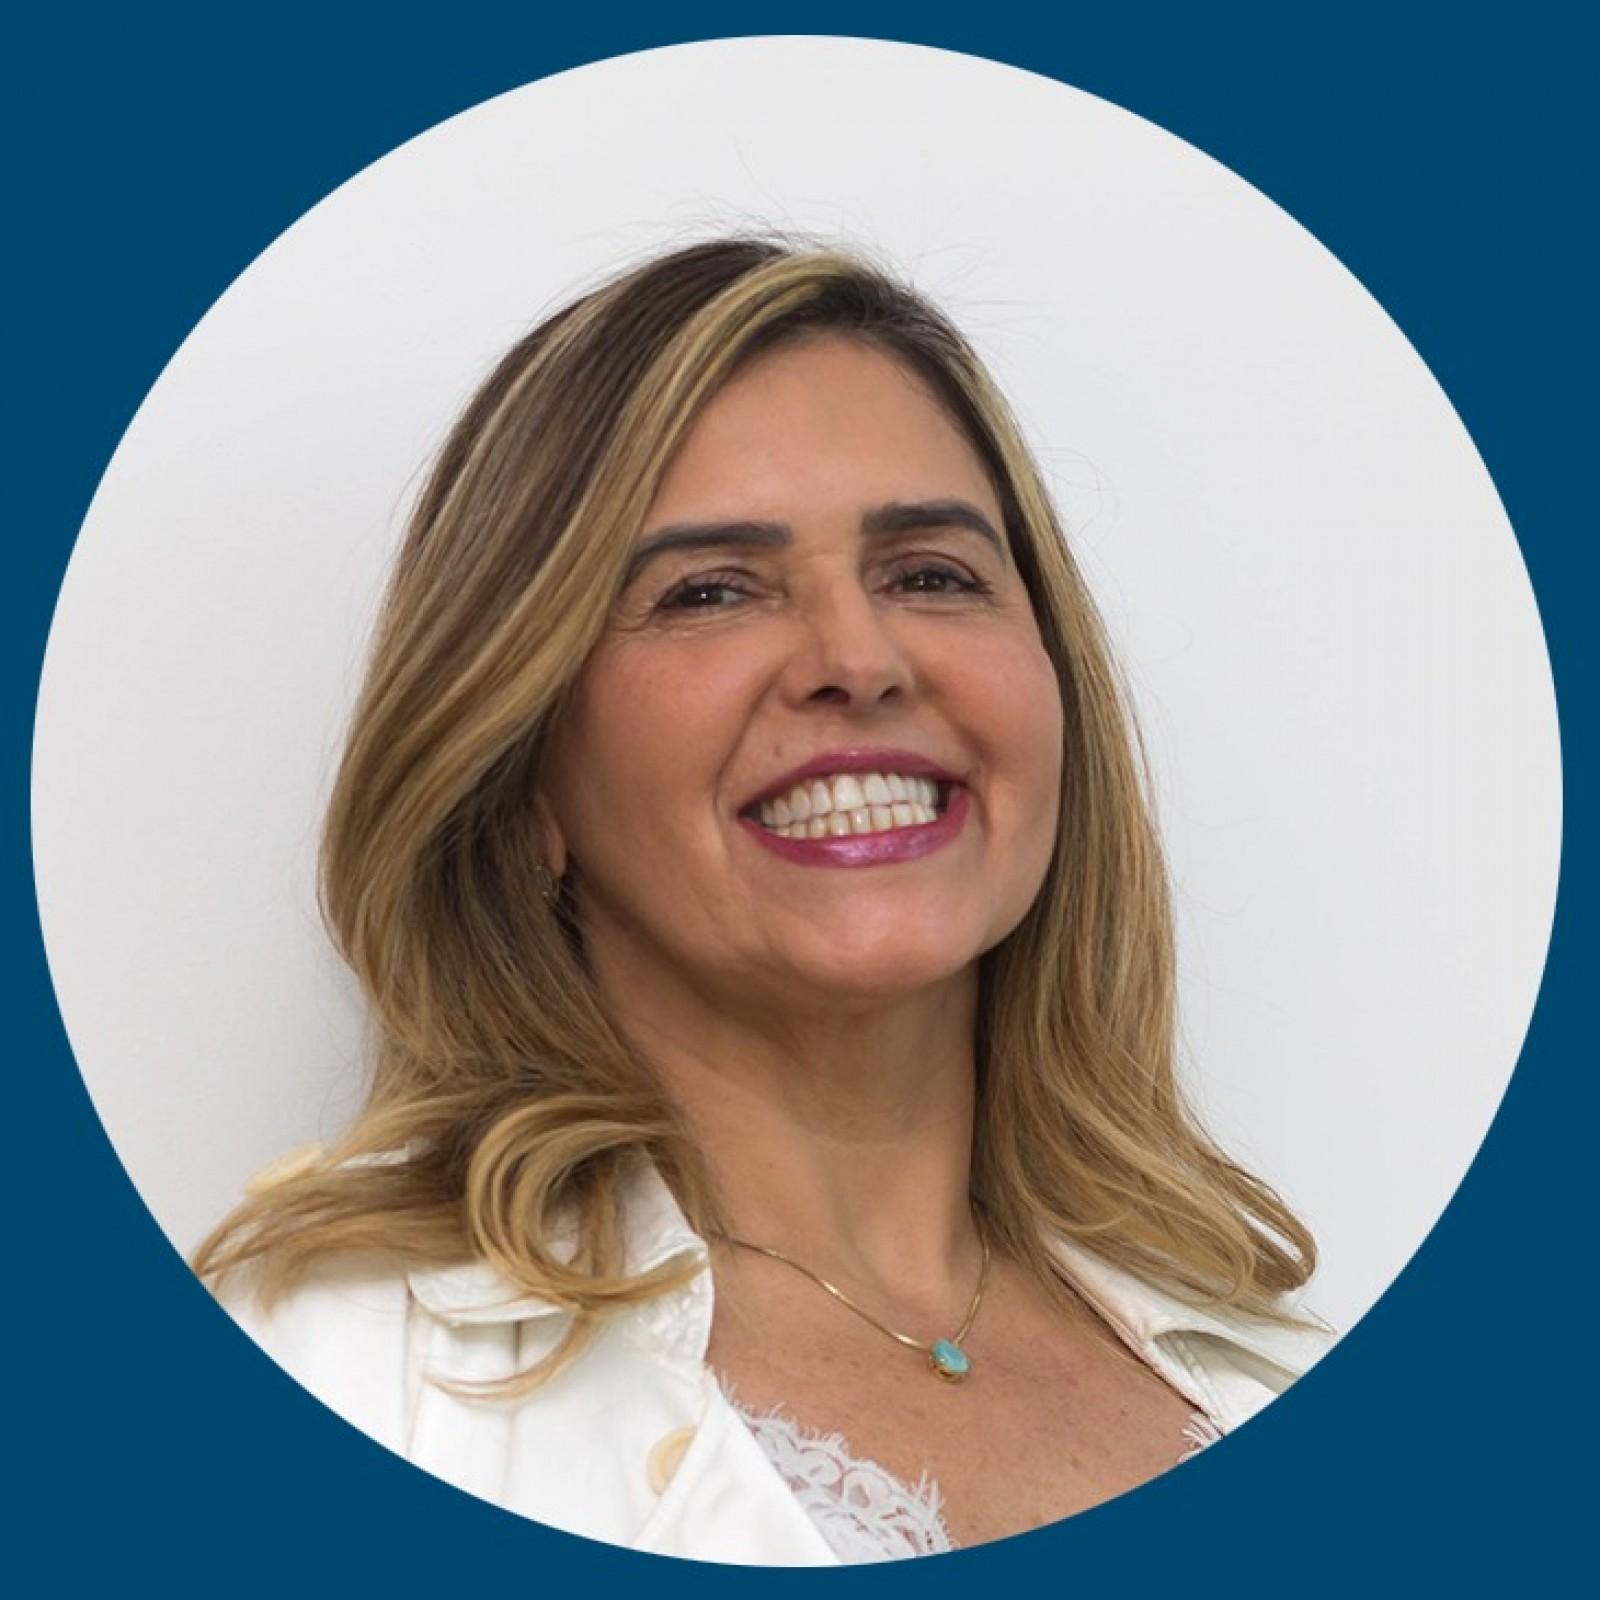 Dra. Marília Figueiredo